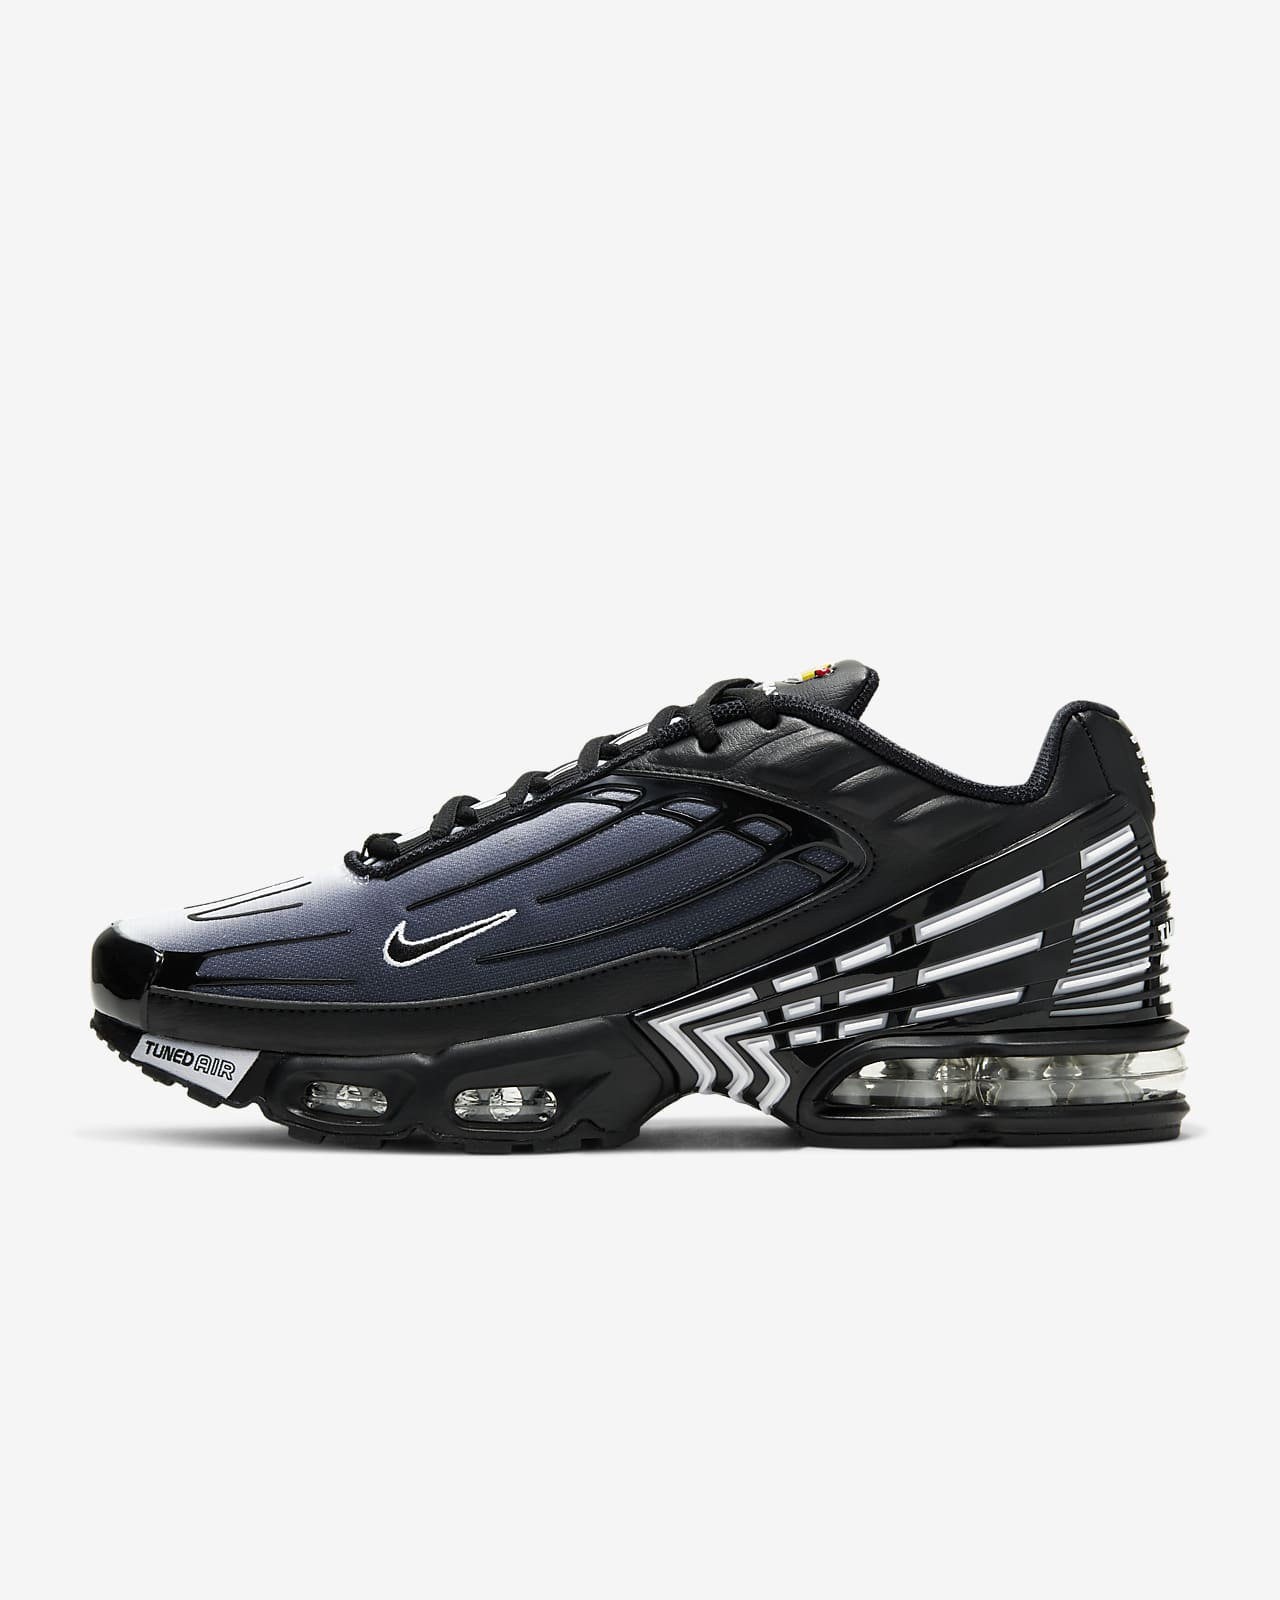 Nike Air Max Plus III Men's Shoes. Nike LU